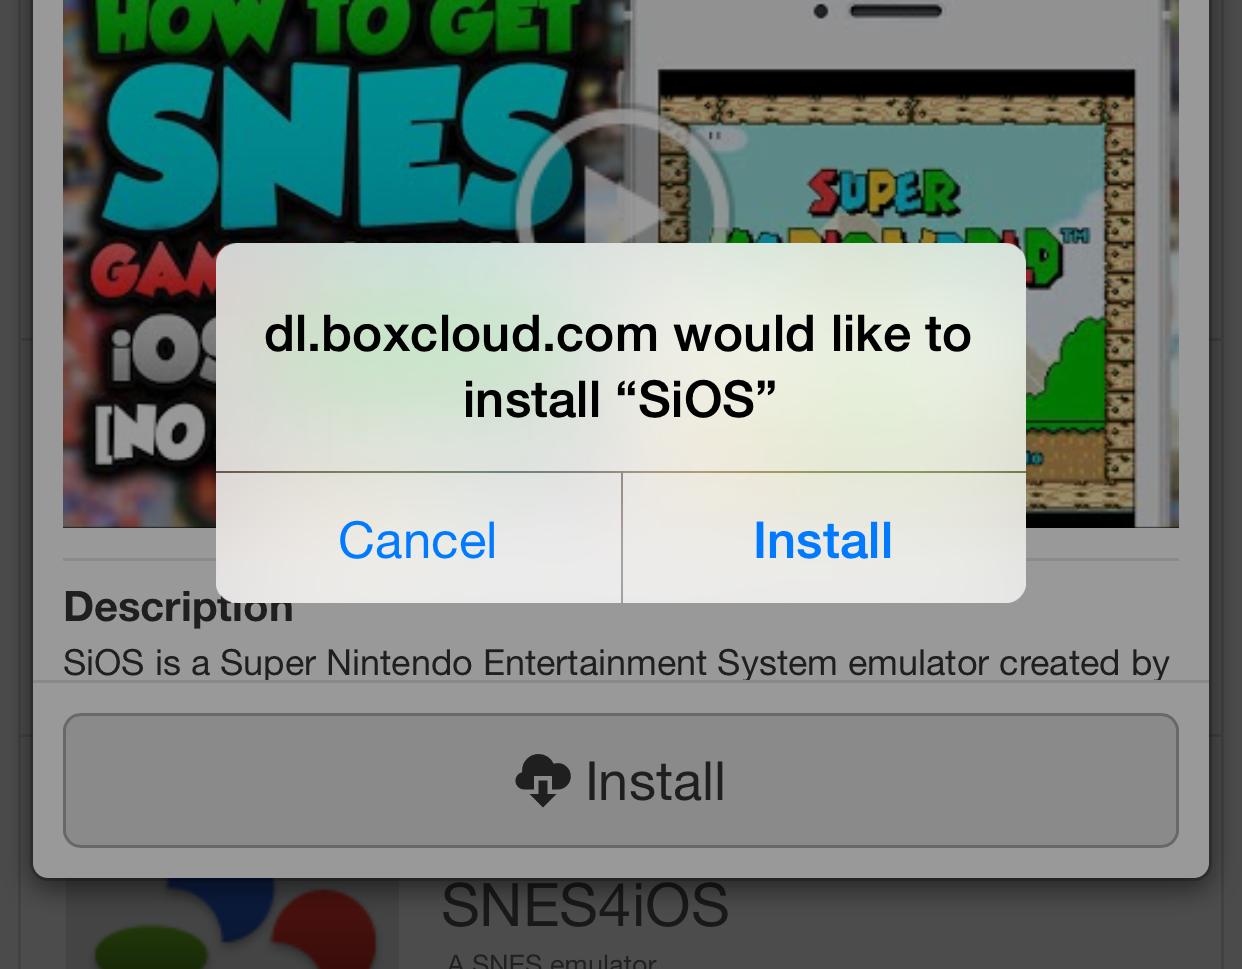 SiOS Emulator install prompt